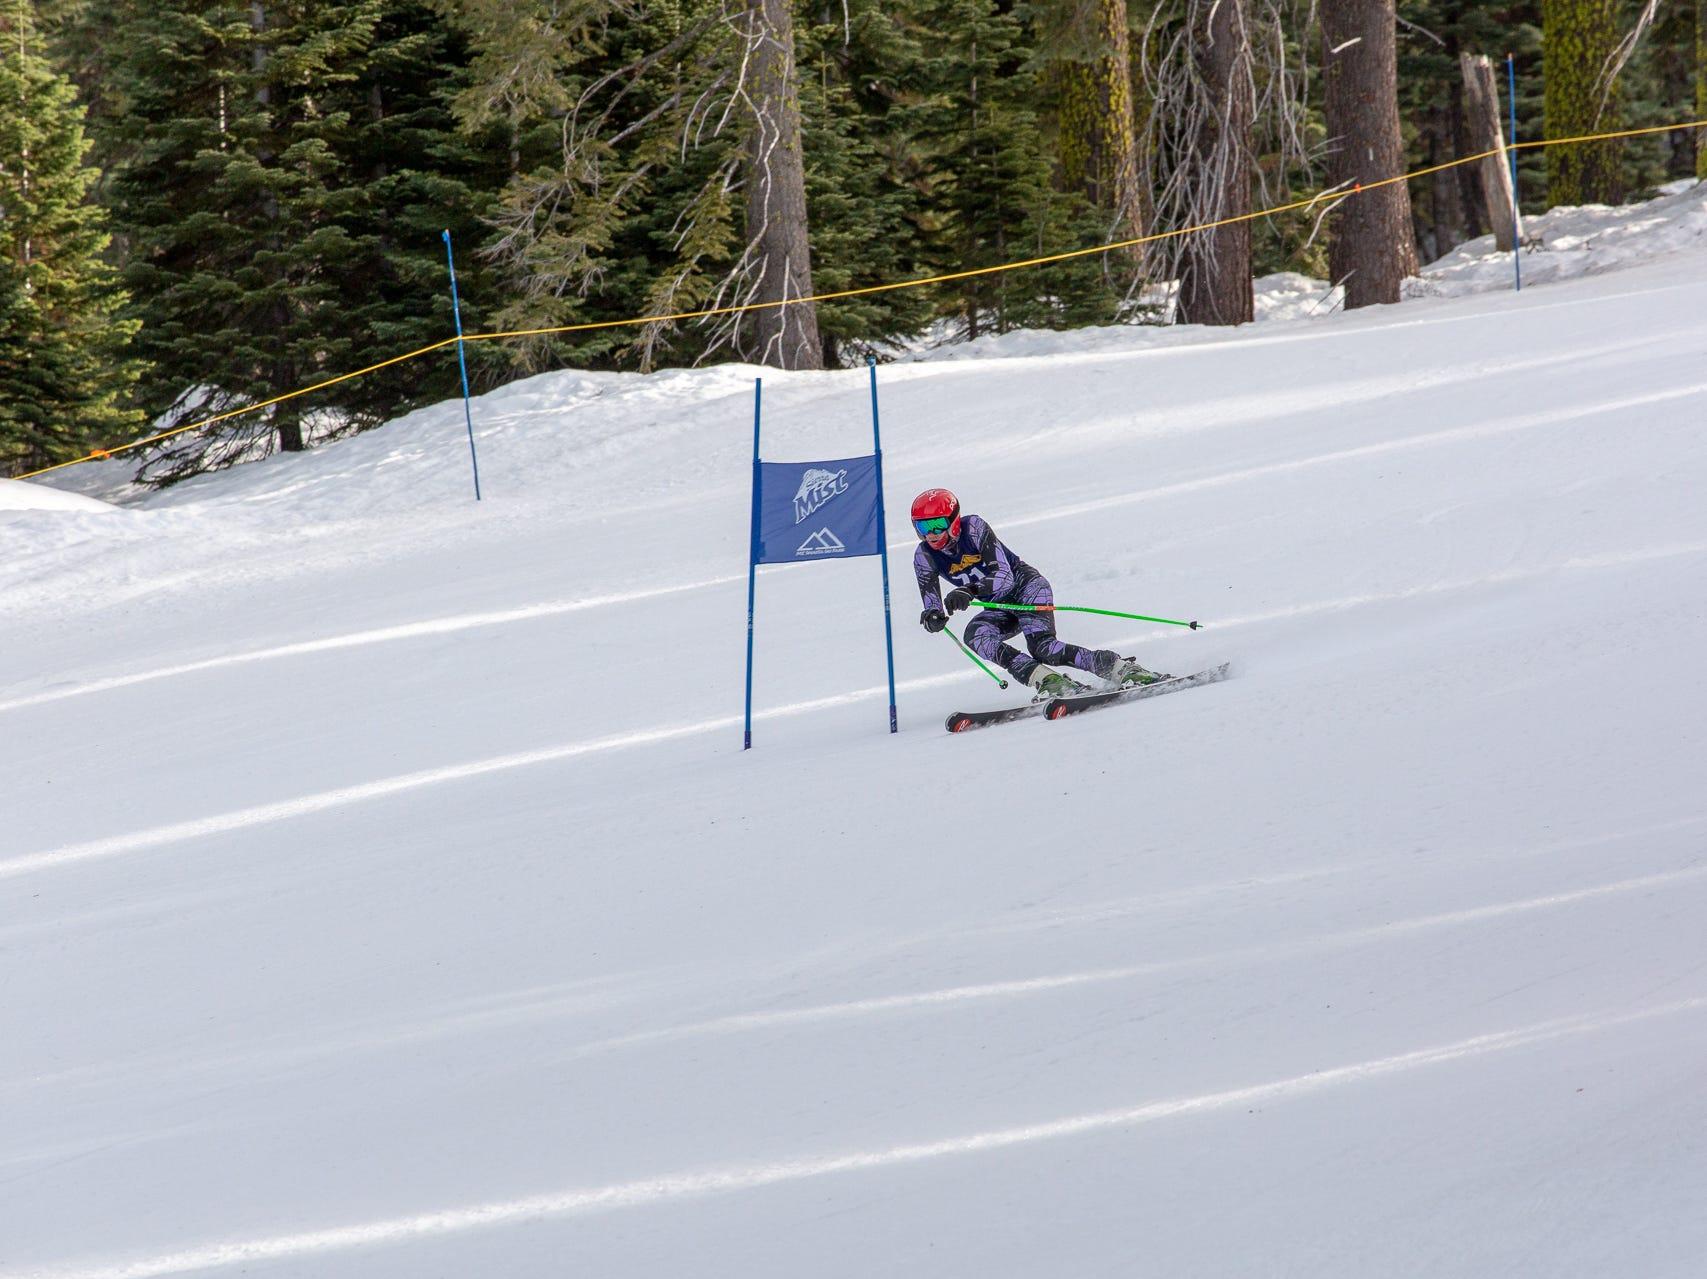 Ian Anderson of Mt. Shasta races in the third high school ski meet of 2019 on Monday, Jan. 28 at Mt. Shasta Ski Park.